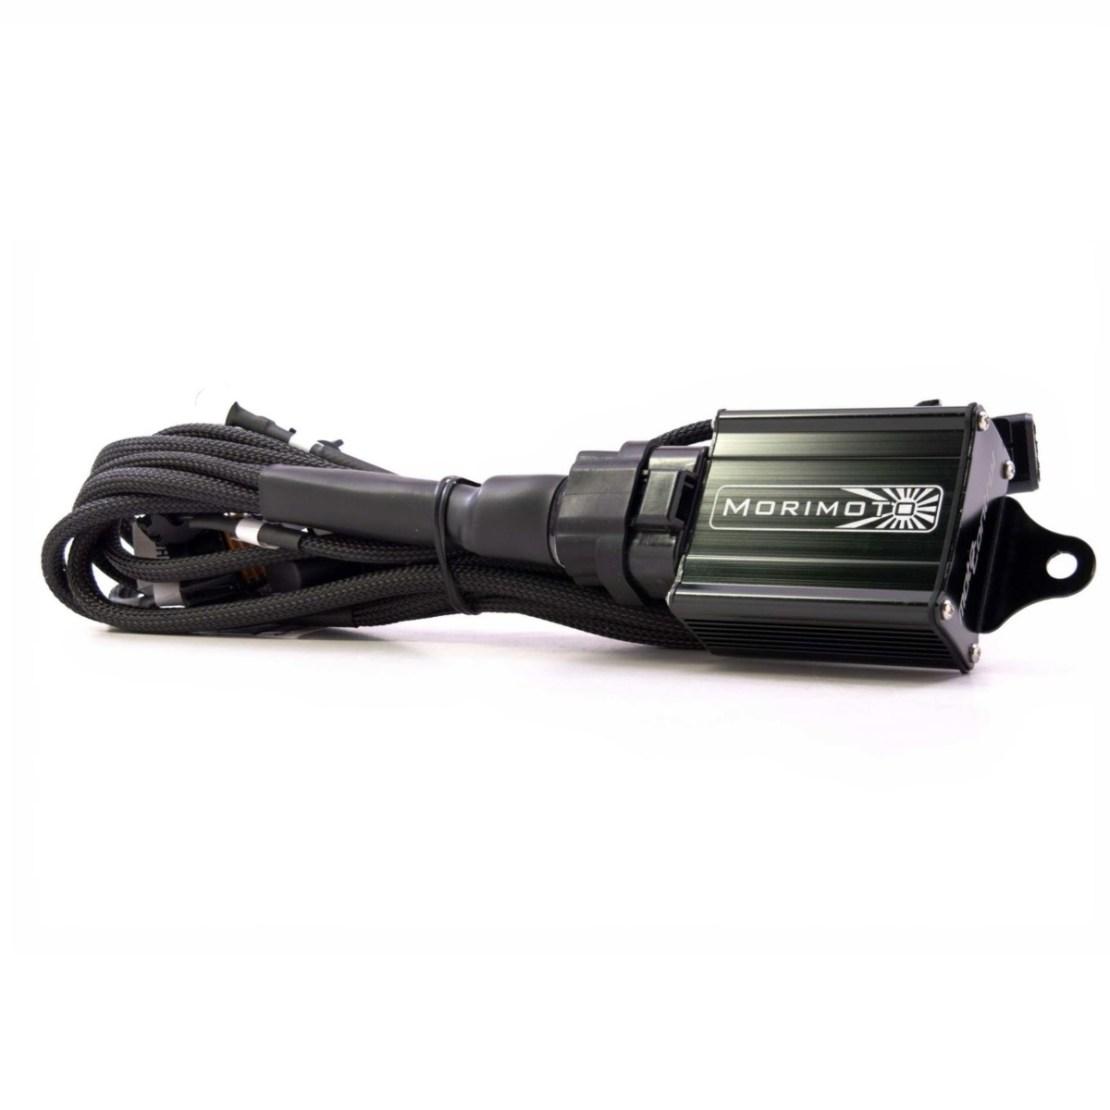 H13 Wiring Harness Hid Kit Headlight Morimoto 9008 Hi Lo Bi Xenon Pros On